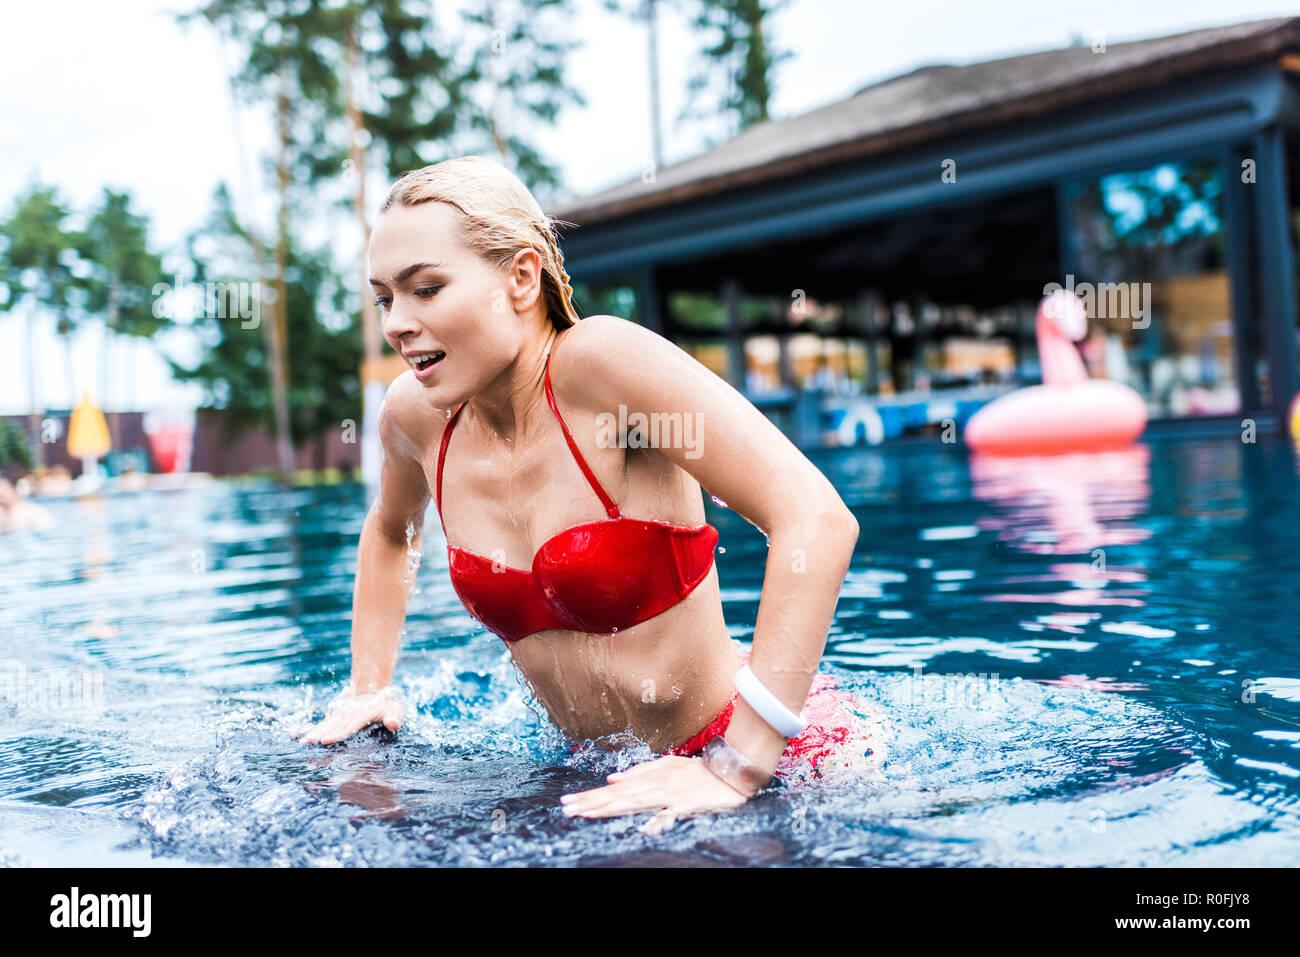 Atractiva mujer joven sonriente nadar en piscina Imagen De Stock